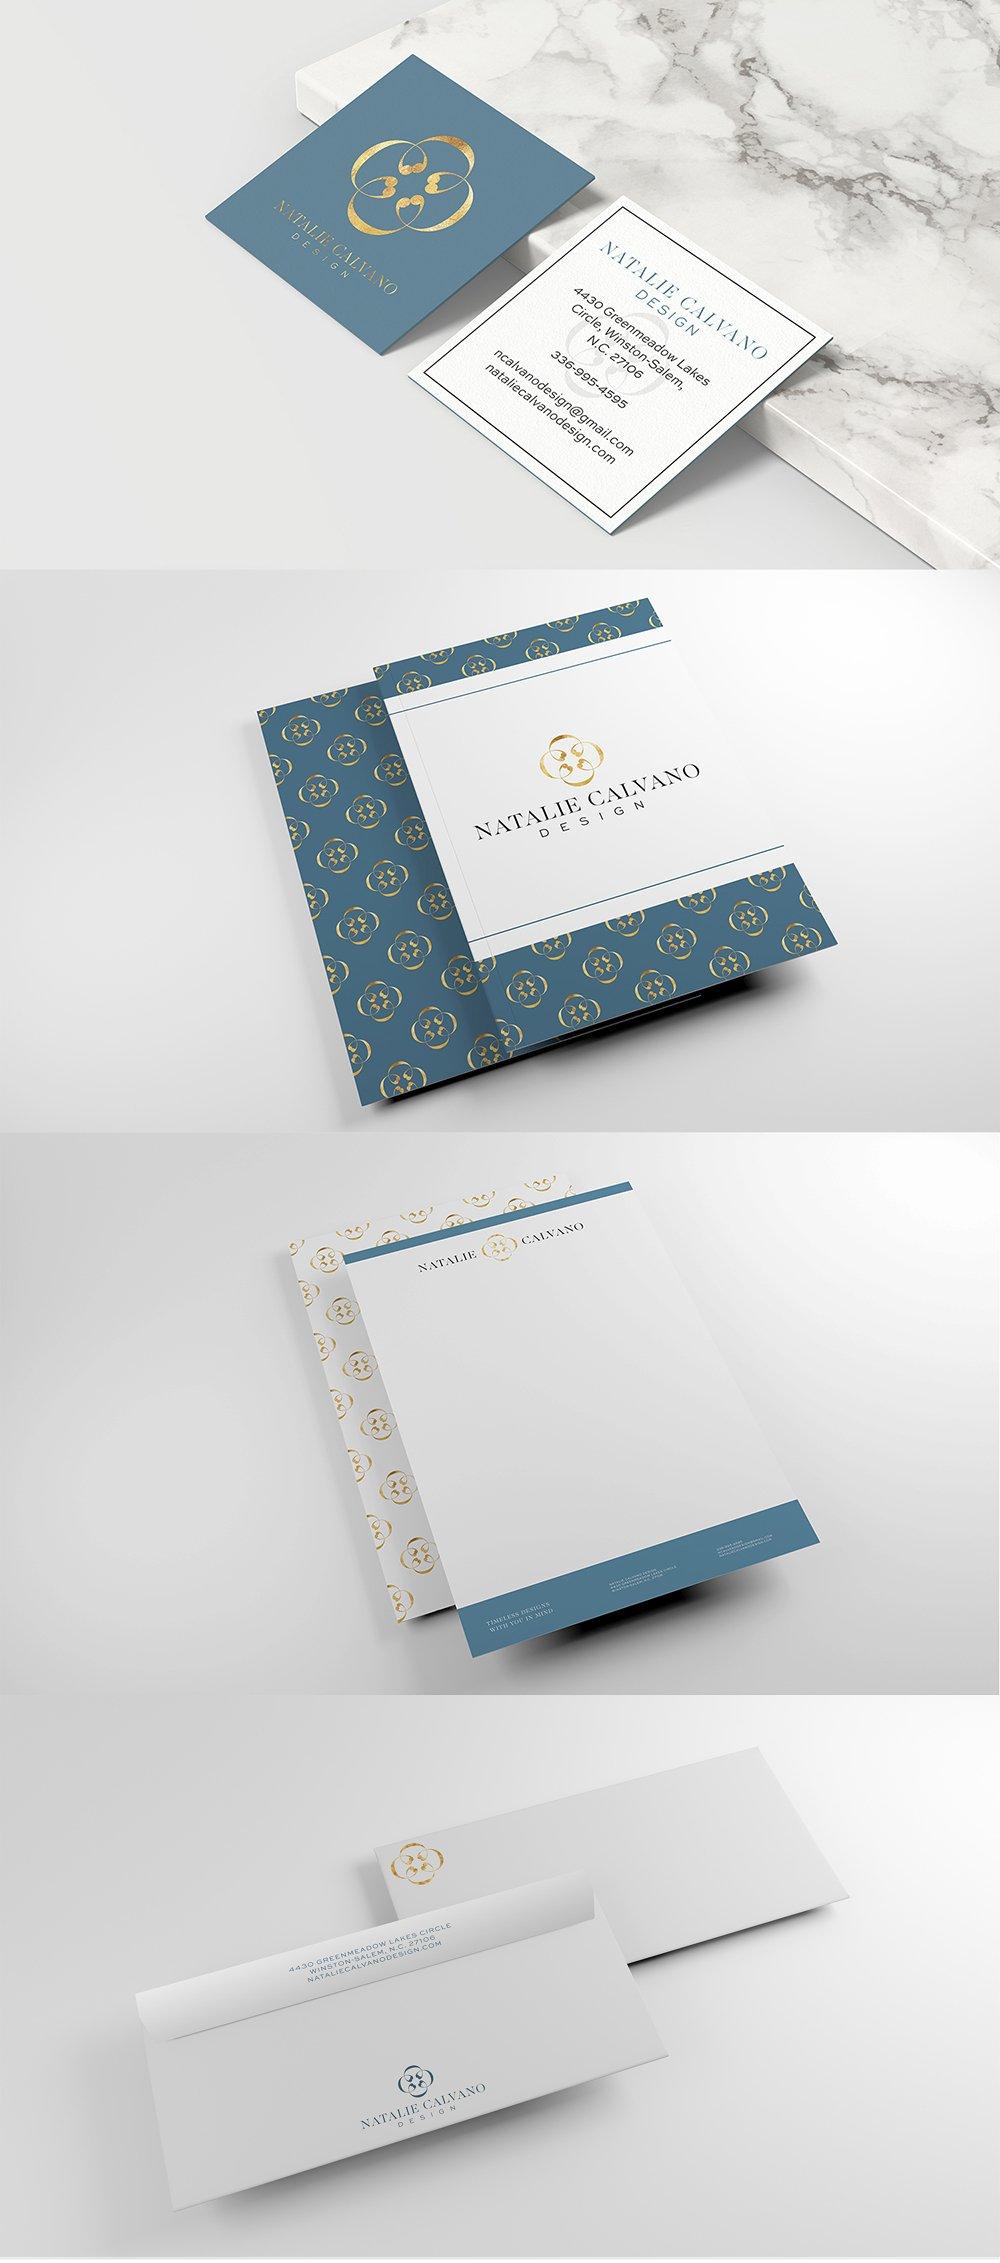 stationery suite design for interior designer Natalie Calvano